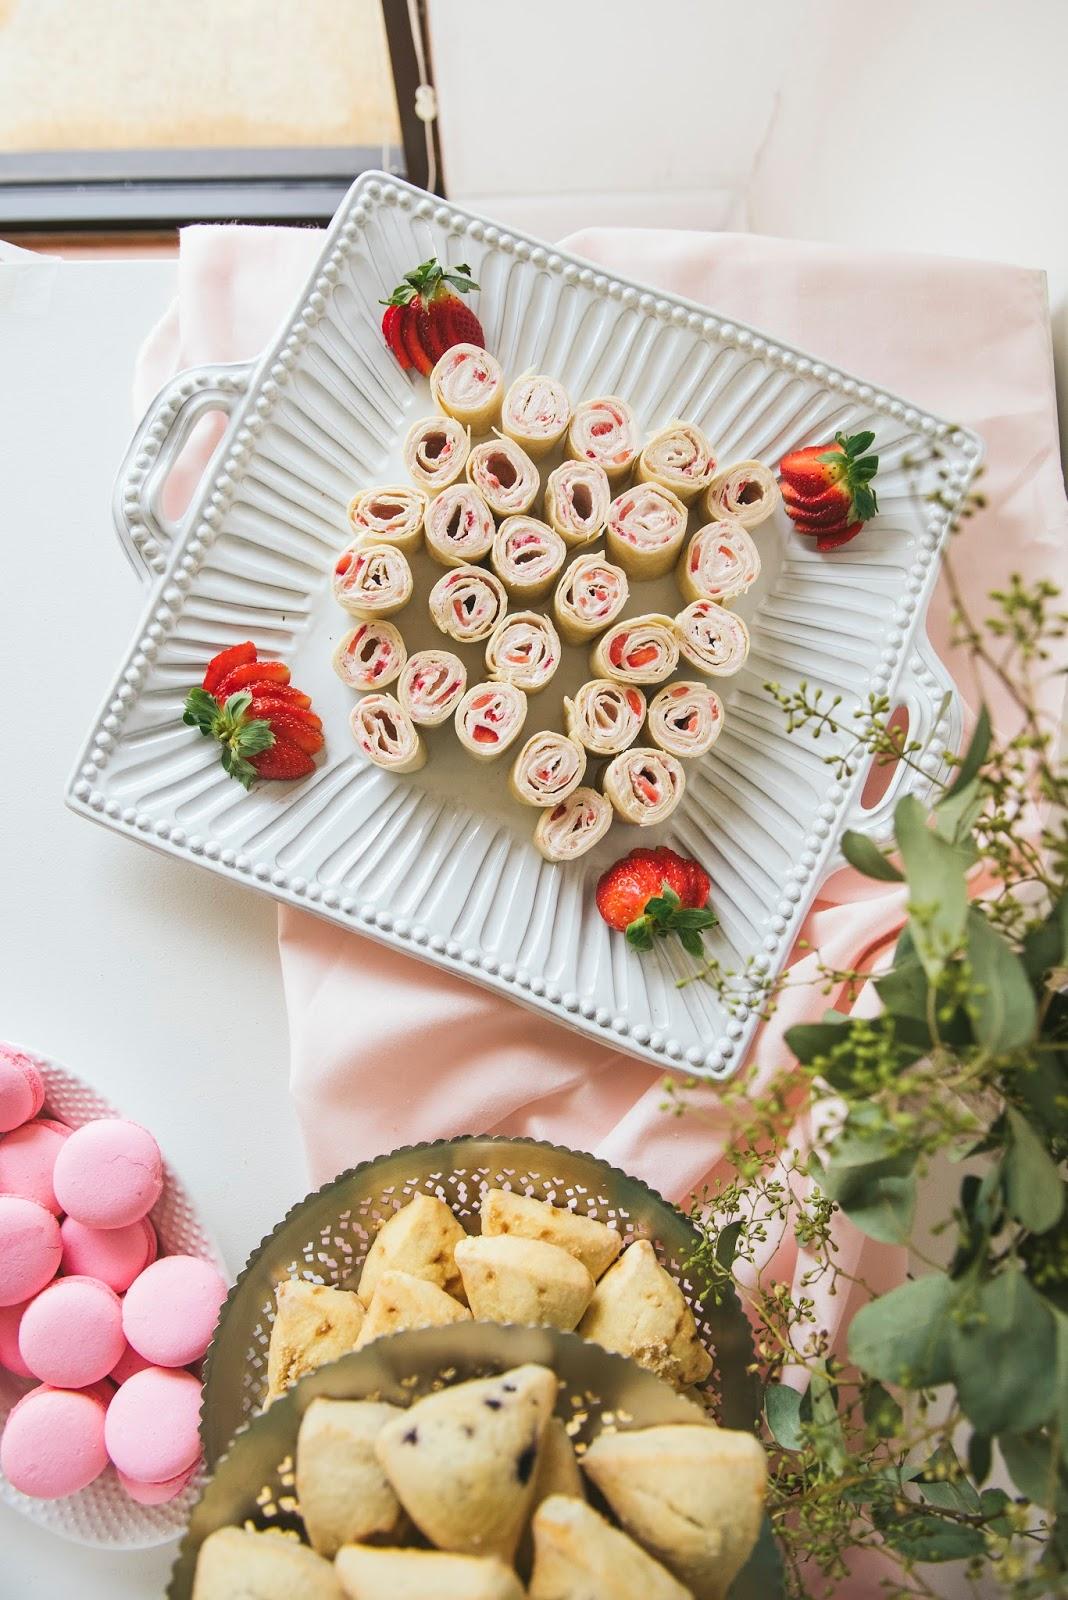 strawberry-cream-cheese-pinwheels-for-valentines-brunch